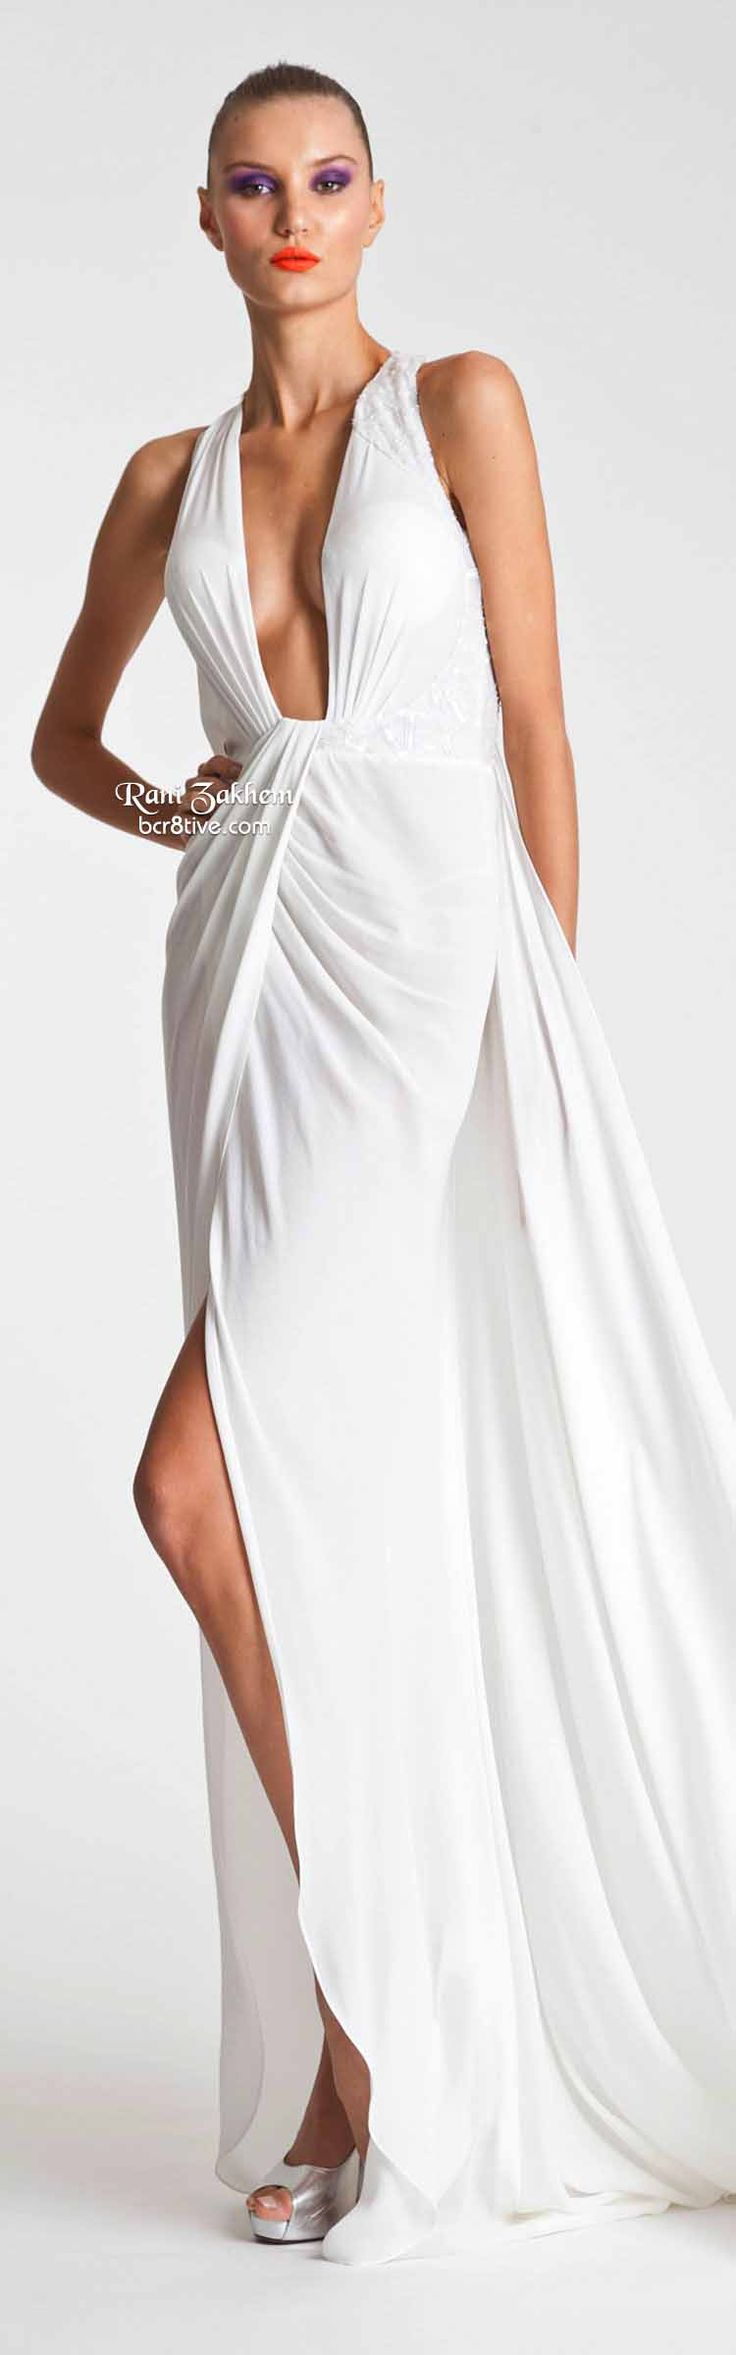 25 Best Ideas About Dubai Fashion On Pinterest Indian Fashion 2014 Wedding Abaya And High